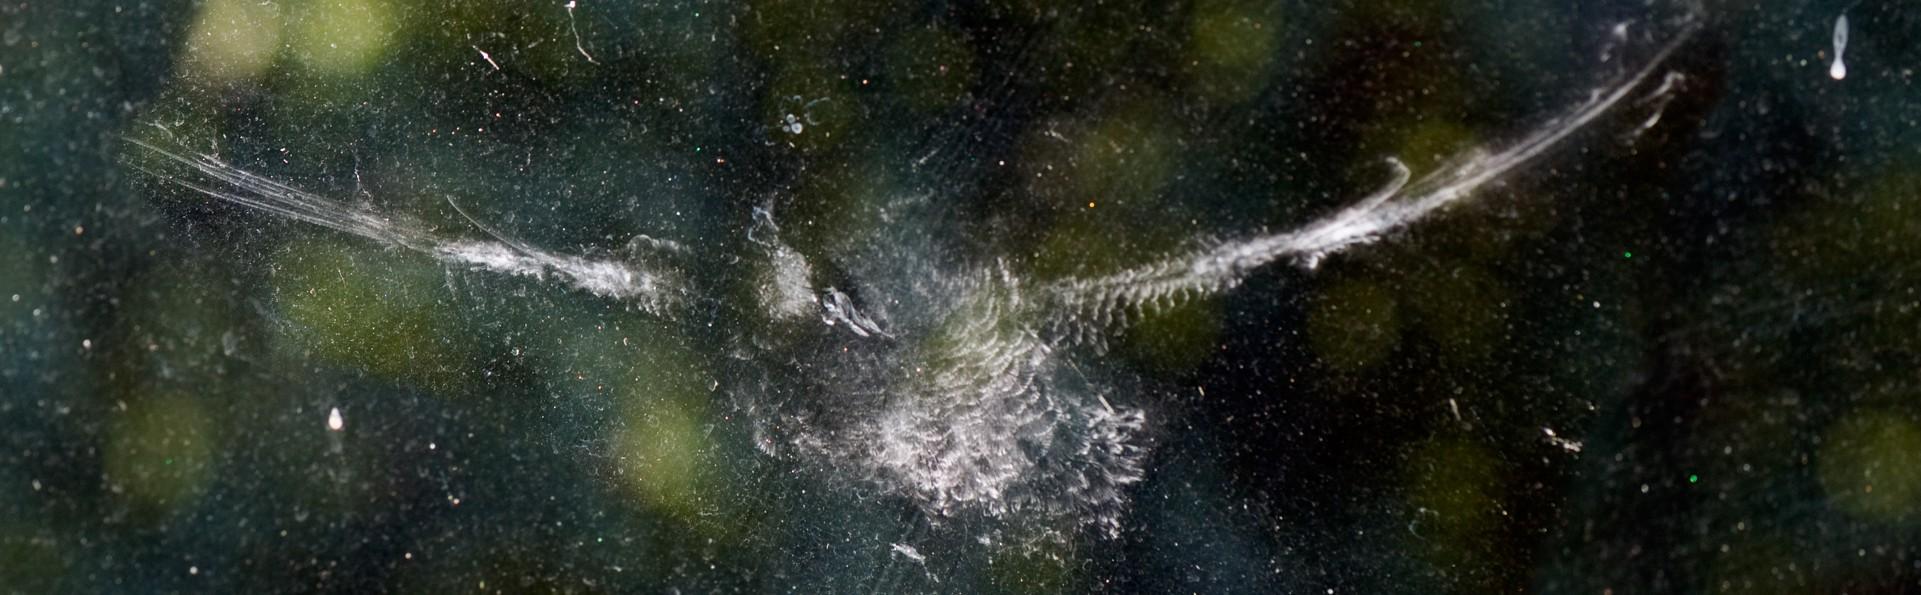 Bird imprint on window. Photo credit: David Fancher